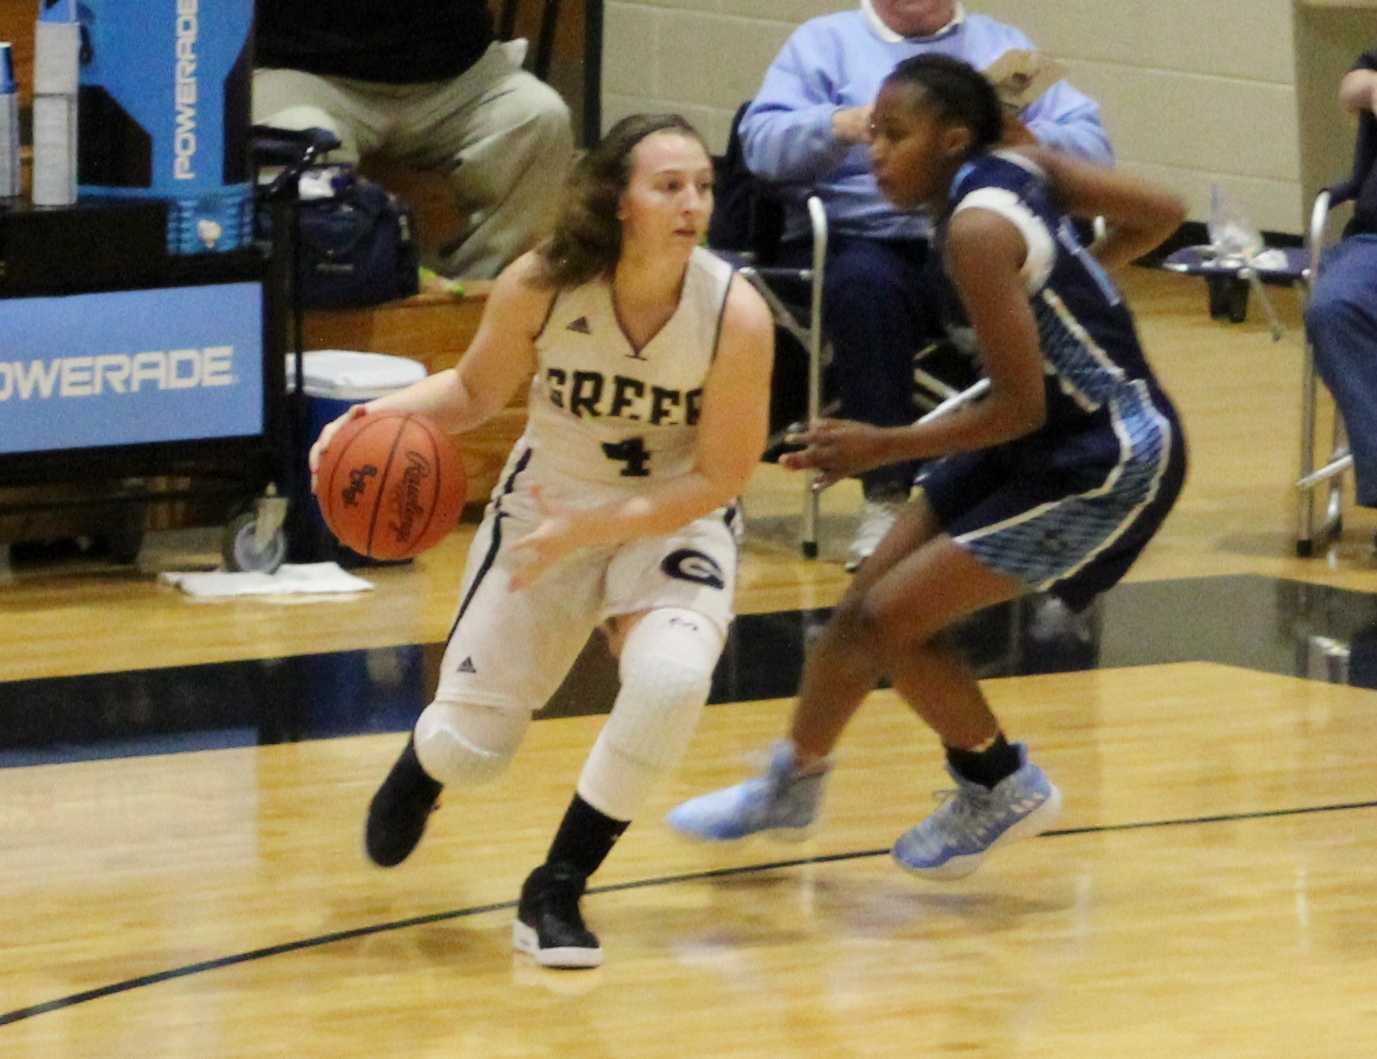 Greer High School sophomore Megan Jones dribbles the ball in the Yellow Jackets' win over Dorman High School Thursday night at Greer High School.